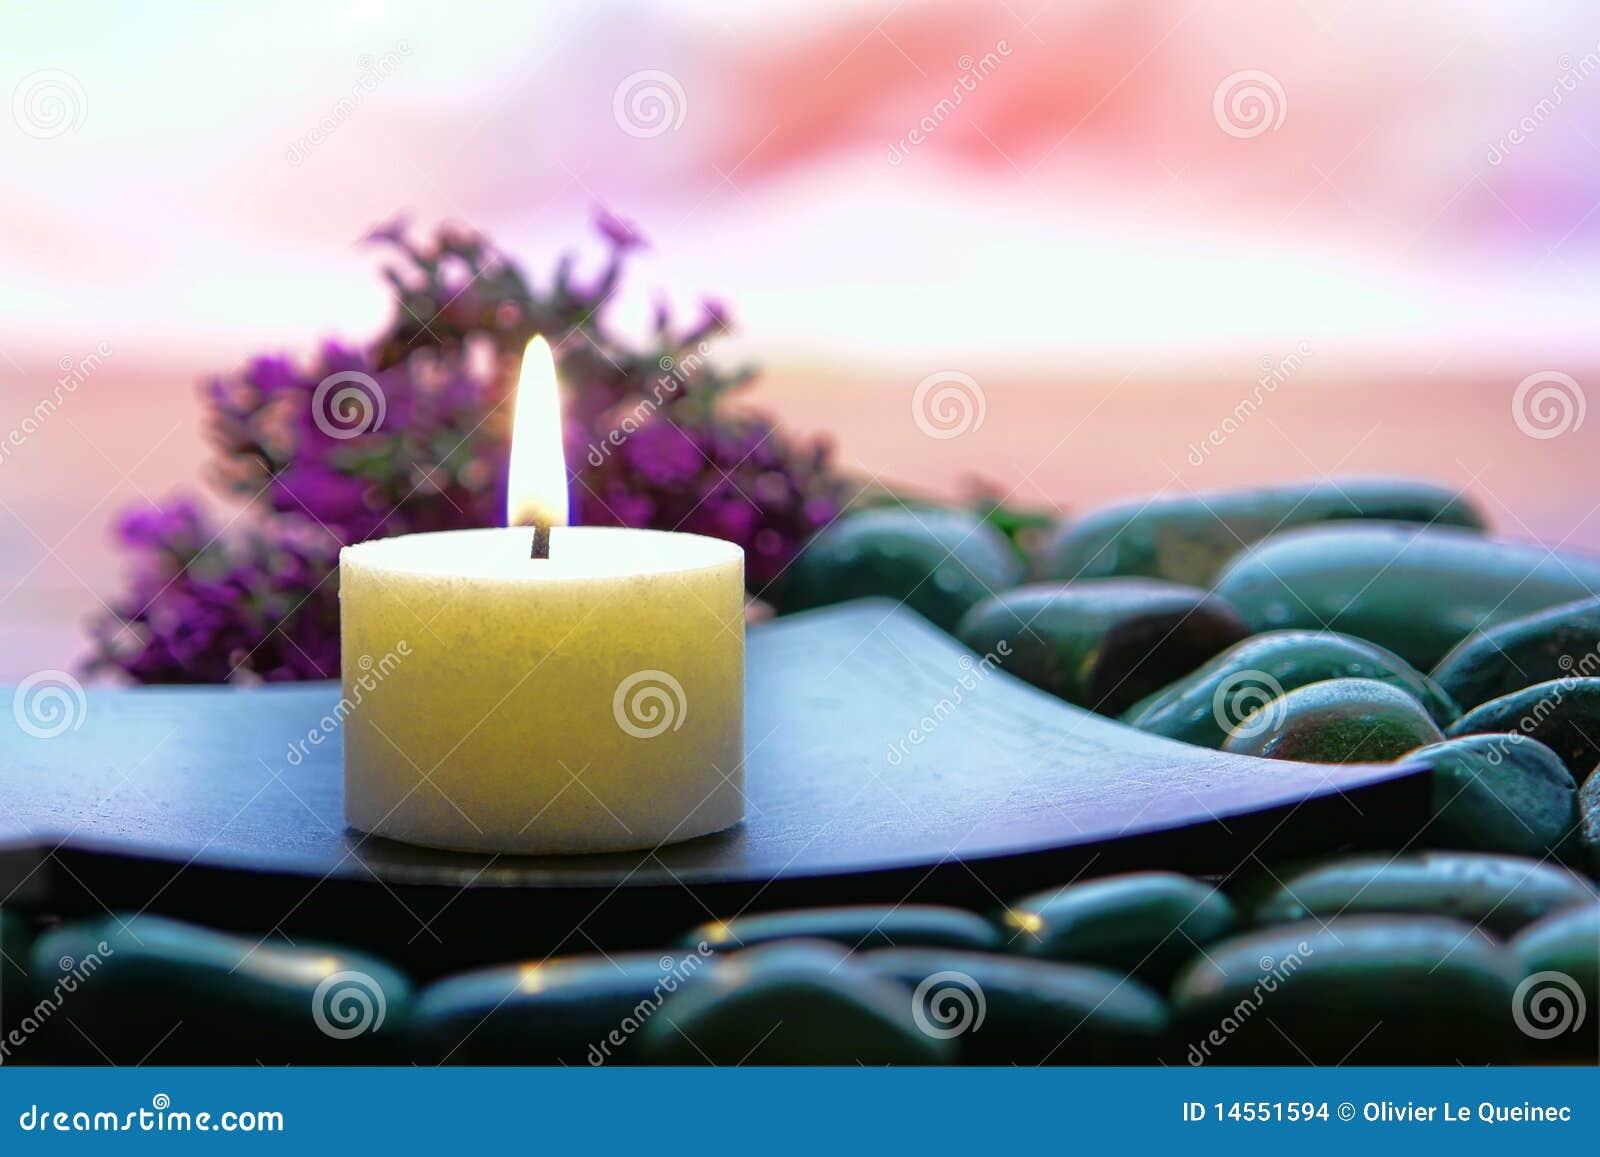 Meditation Candle Burning In Spiritual Zen Session Stock